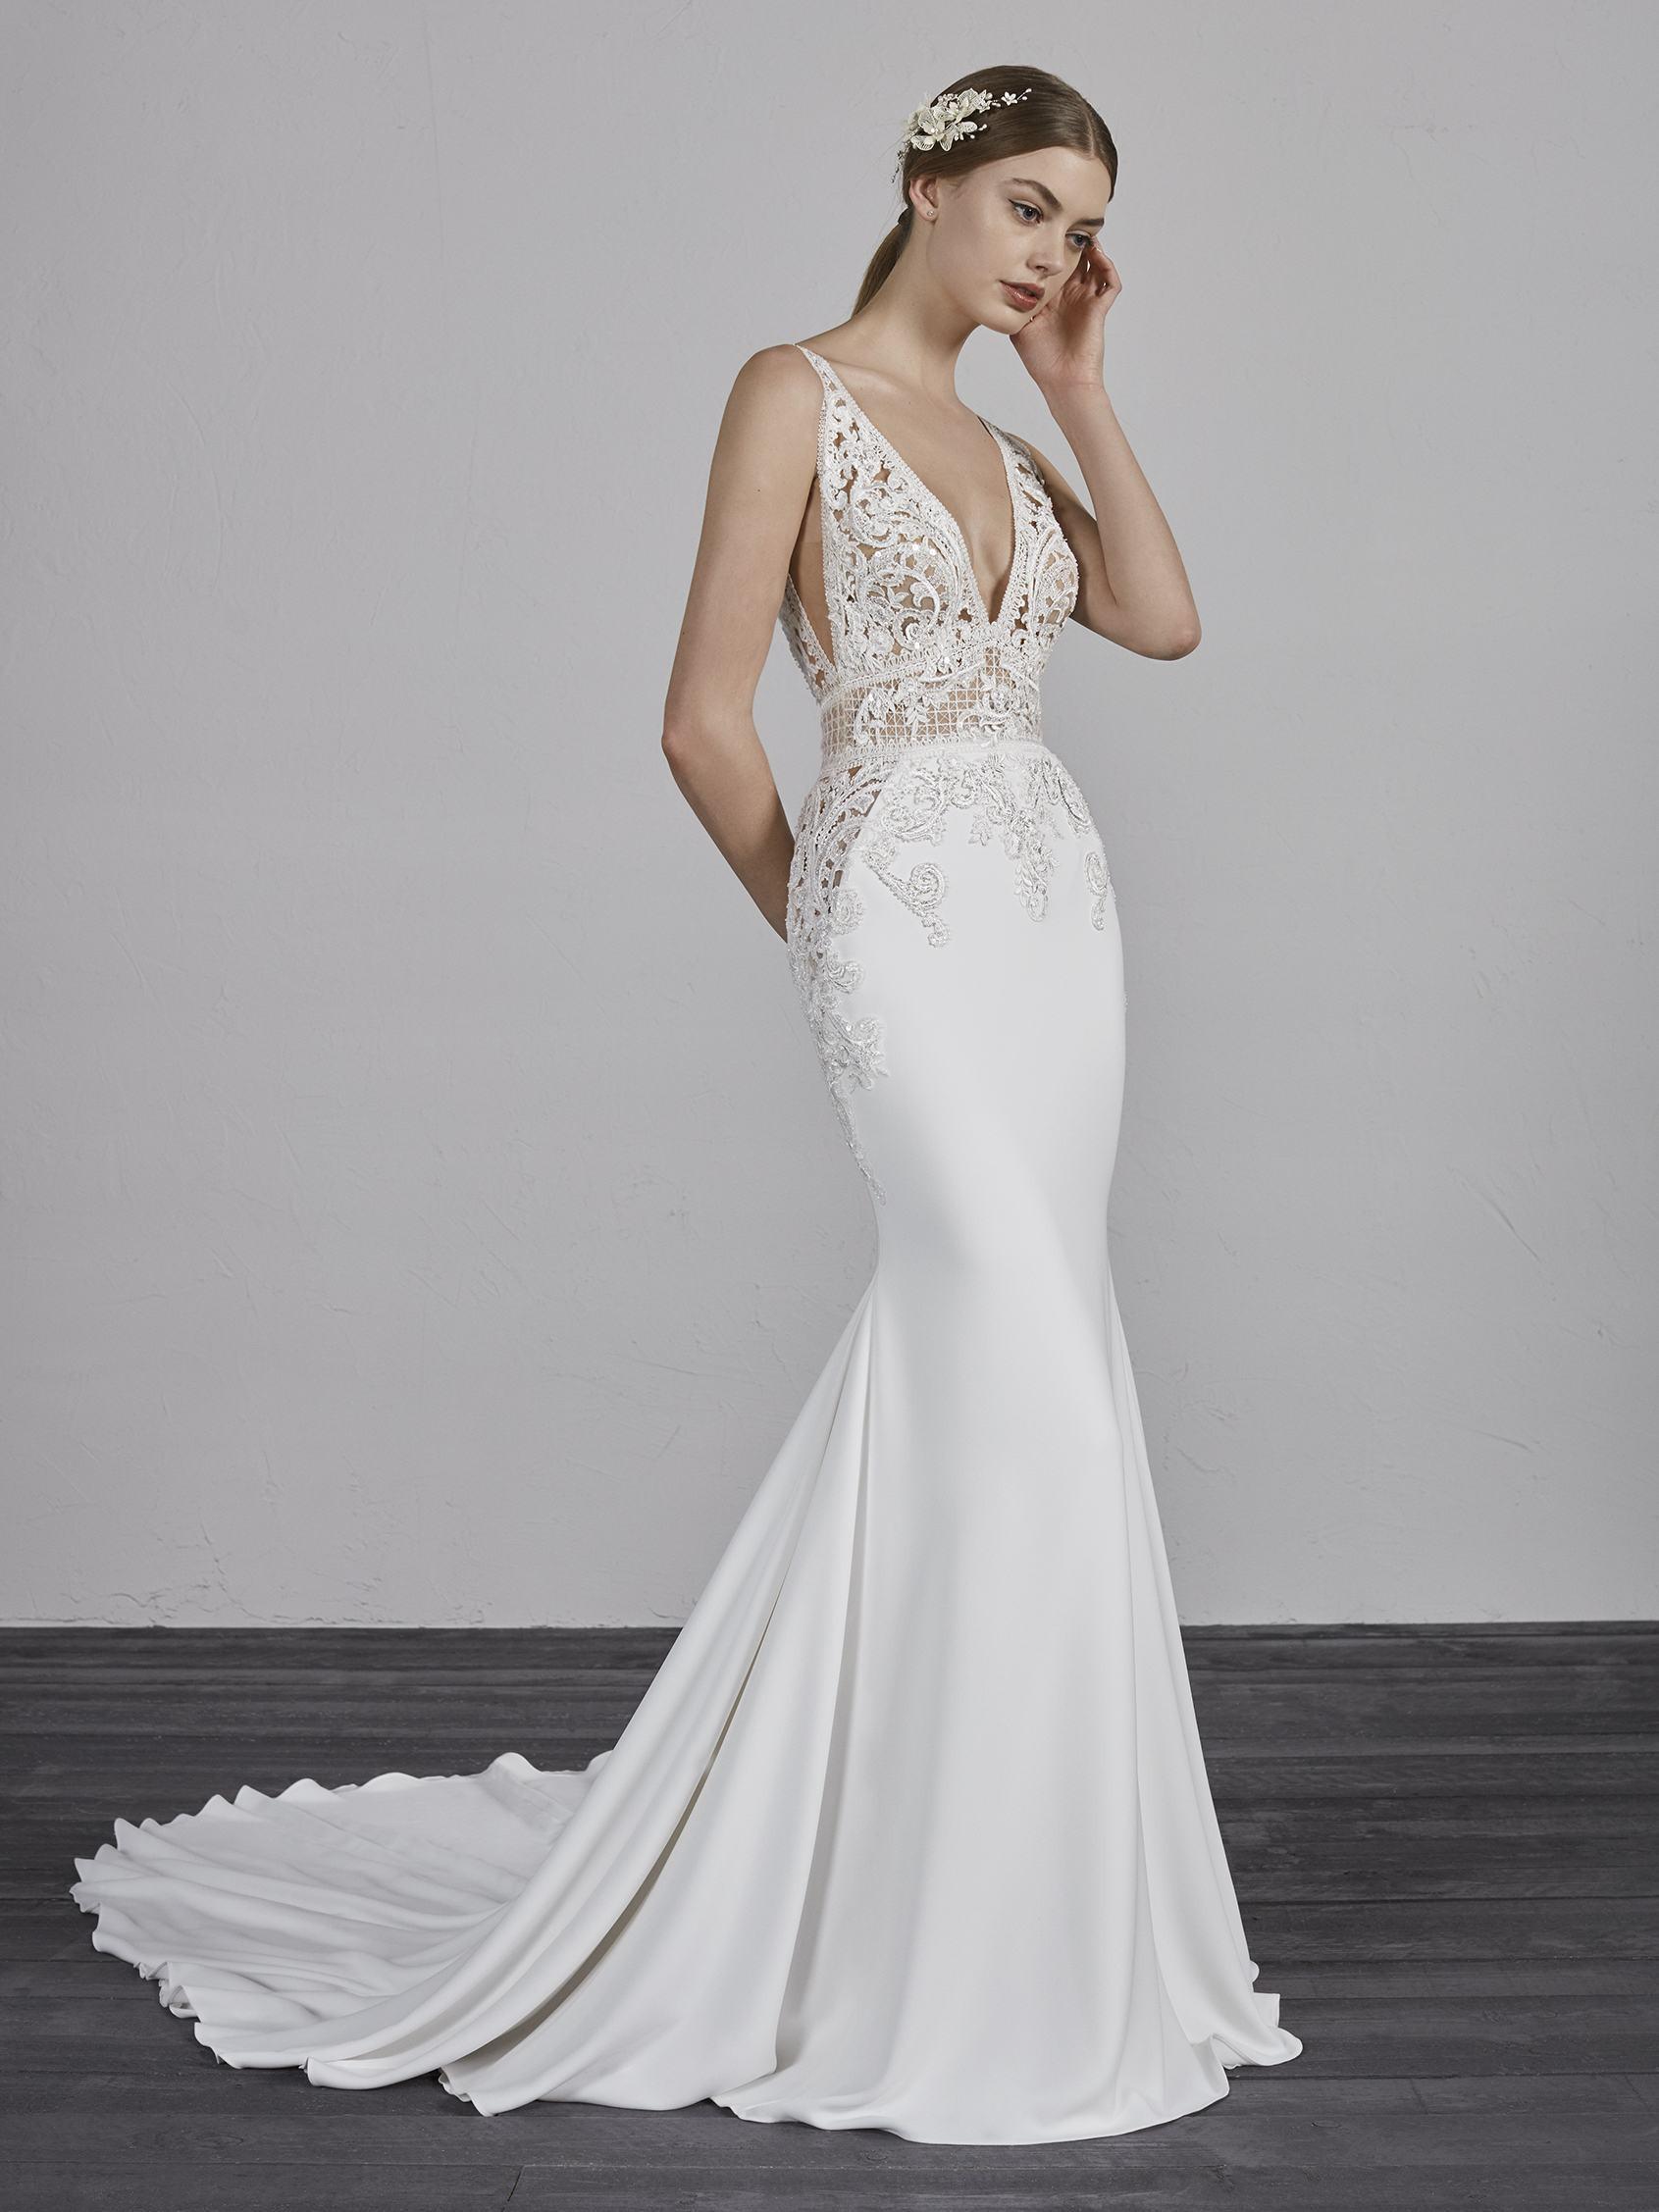 48483a896e6 Pronovias Emily Bridal Dress - Mia Sposa Bridal Boutique Newcastle